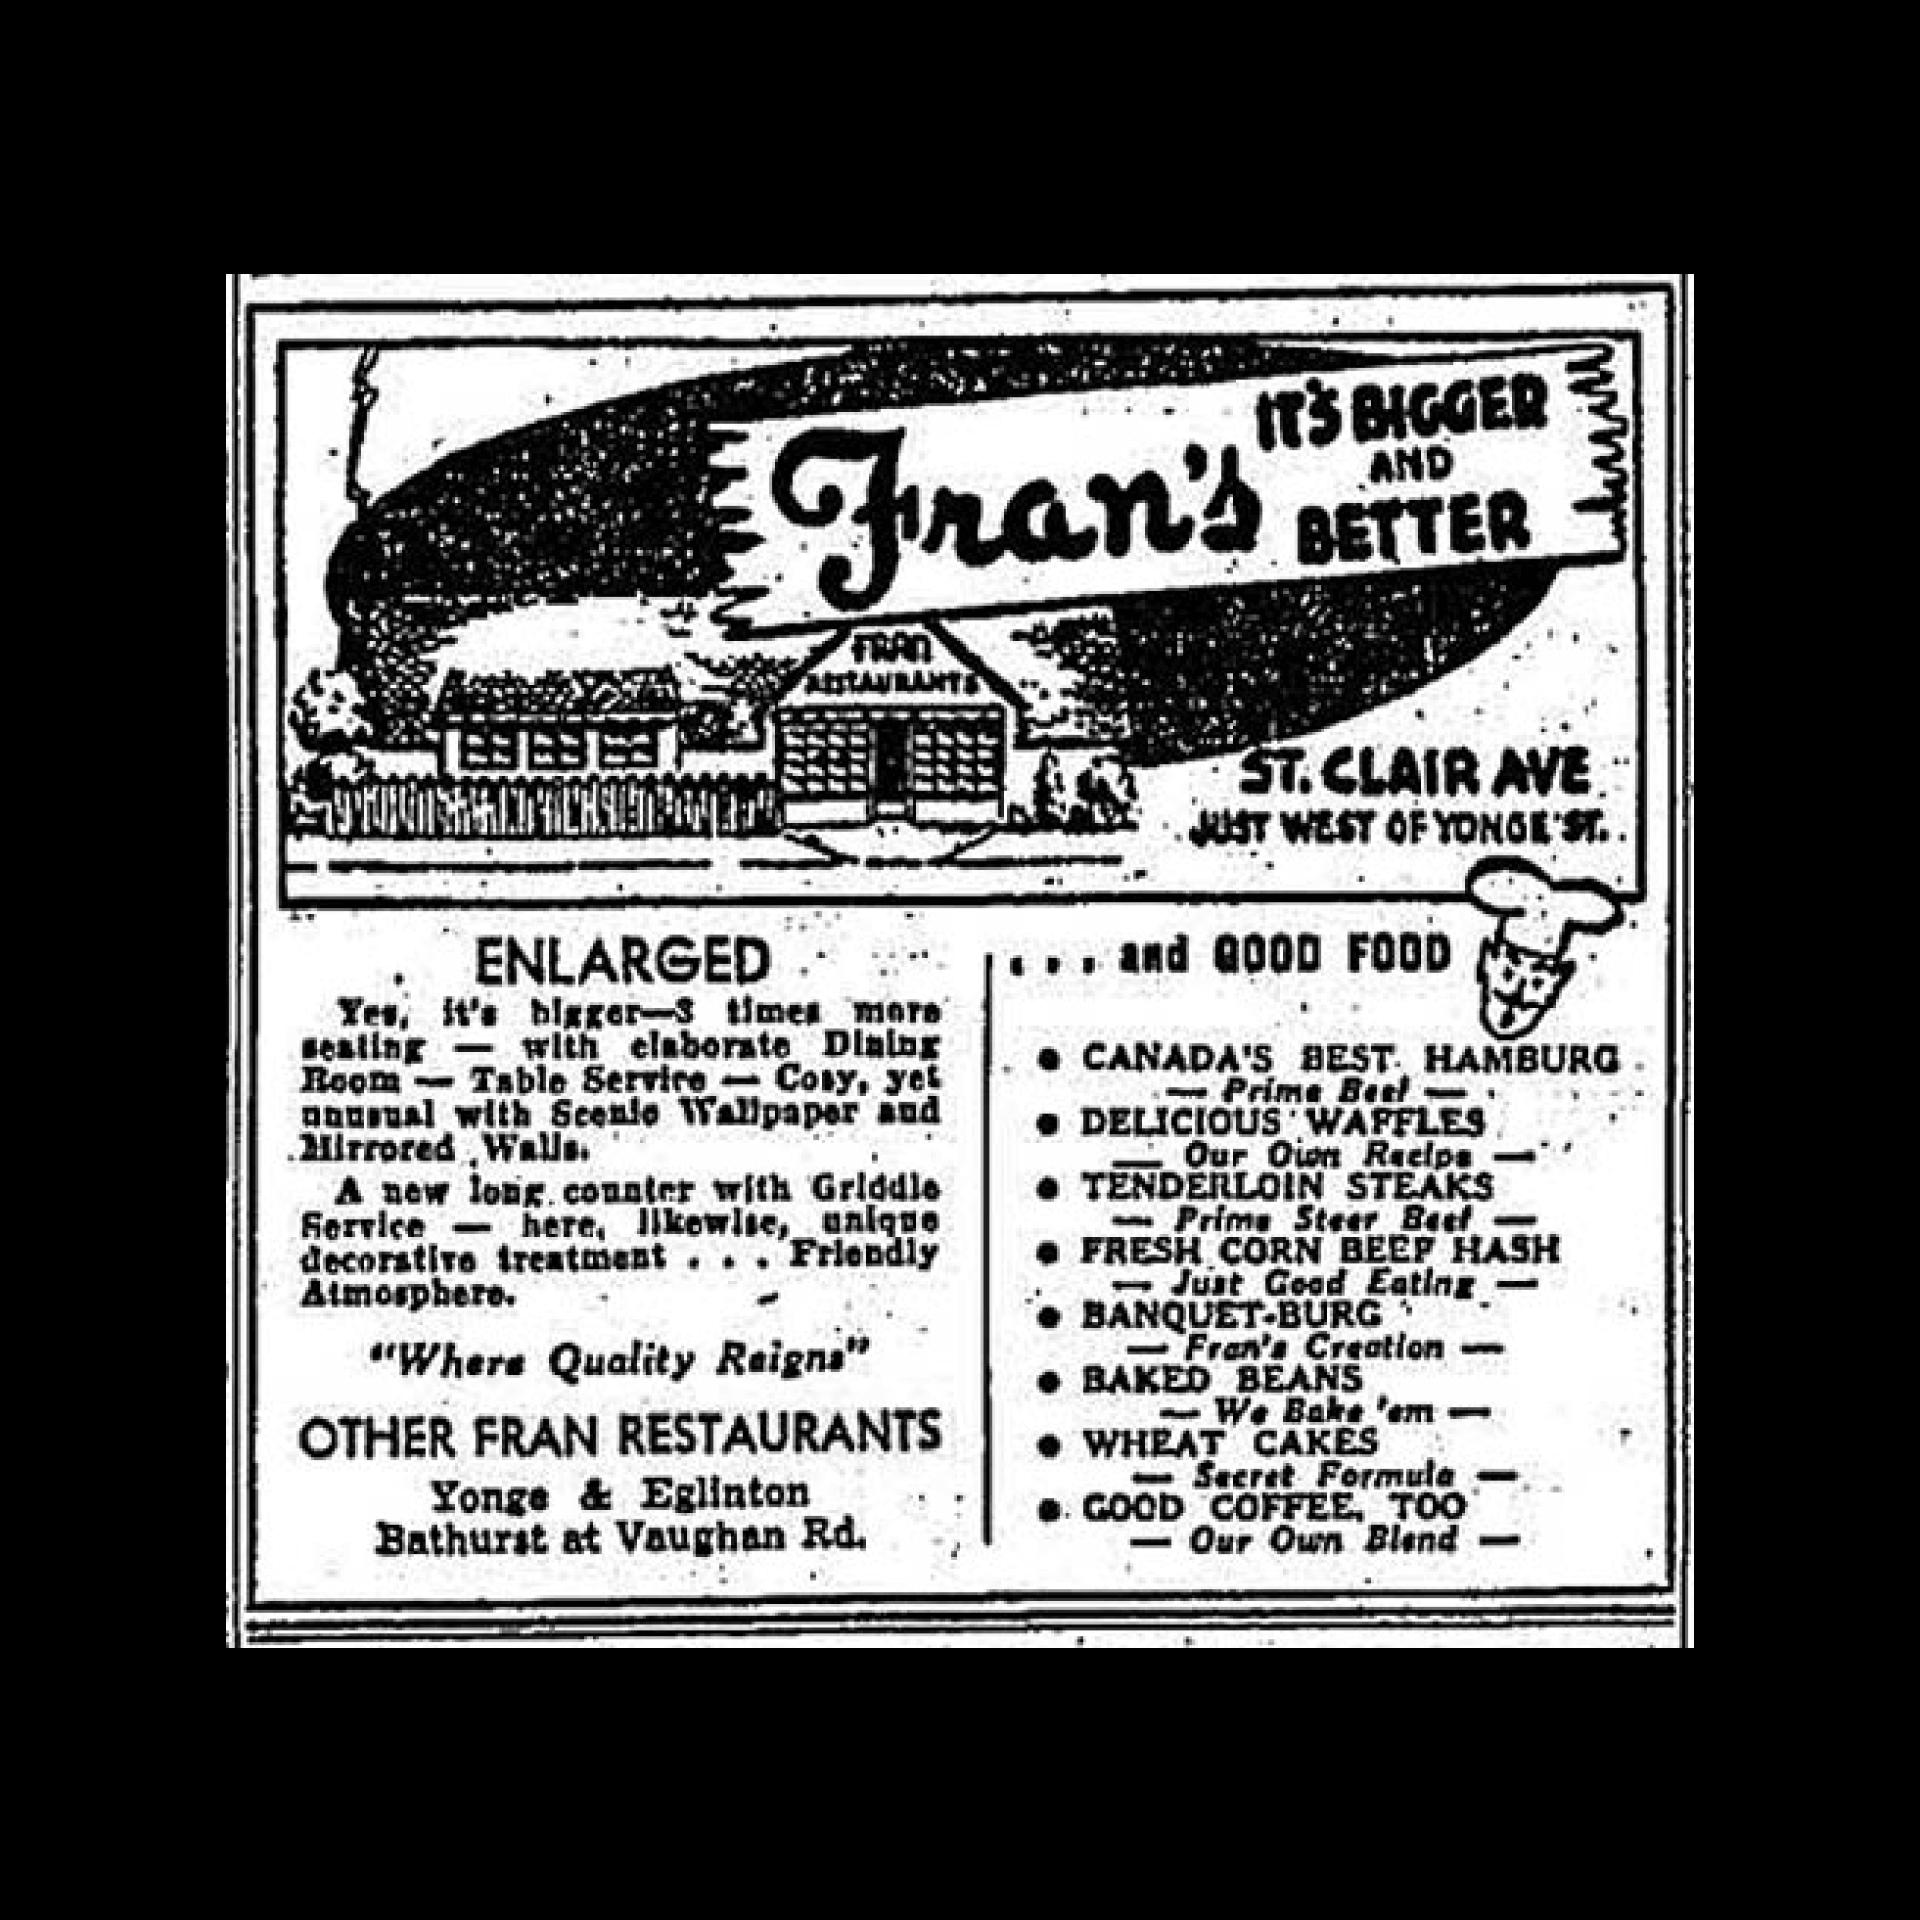 Fran's menu from 1950